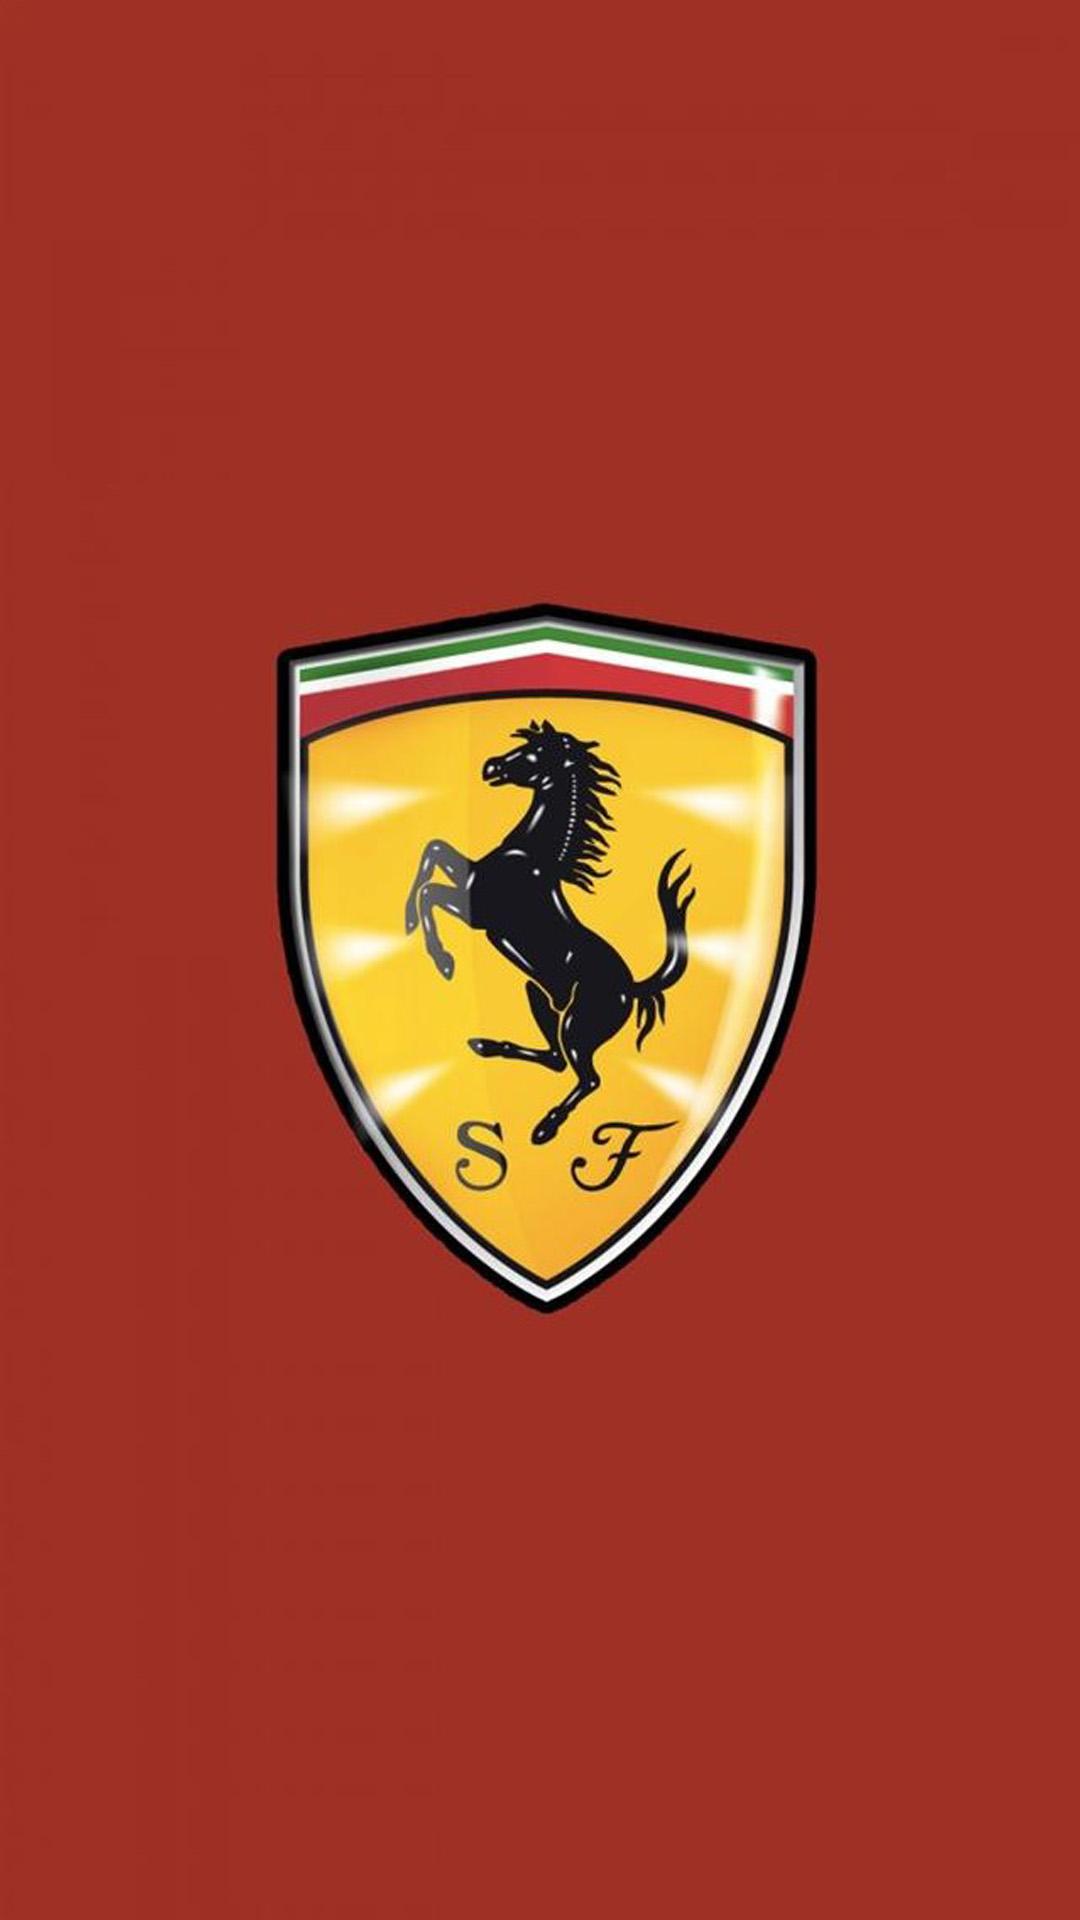 Lamborghini logo 05 Nexus 5 Wallpapers 1080x1920